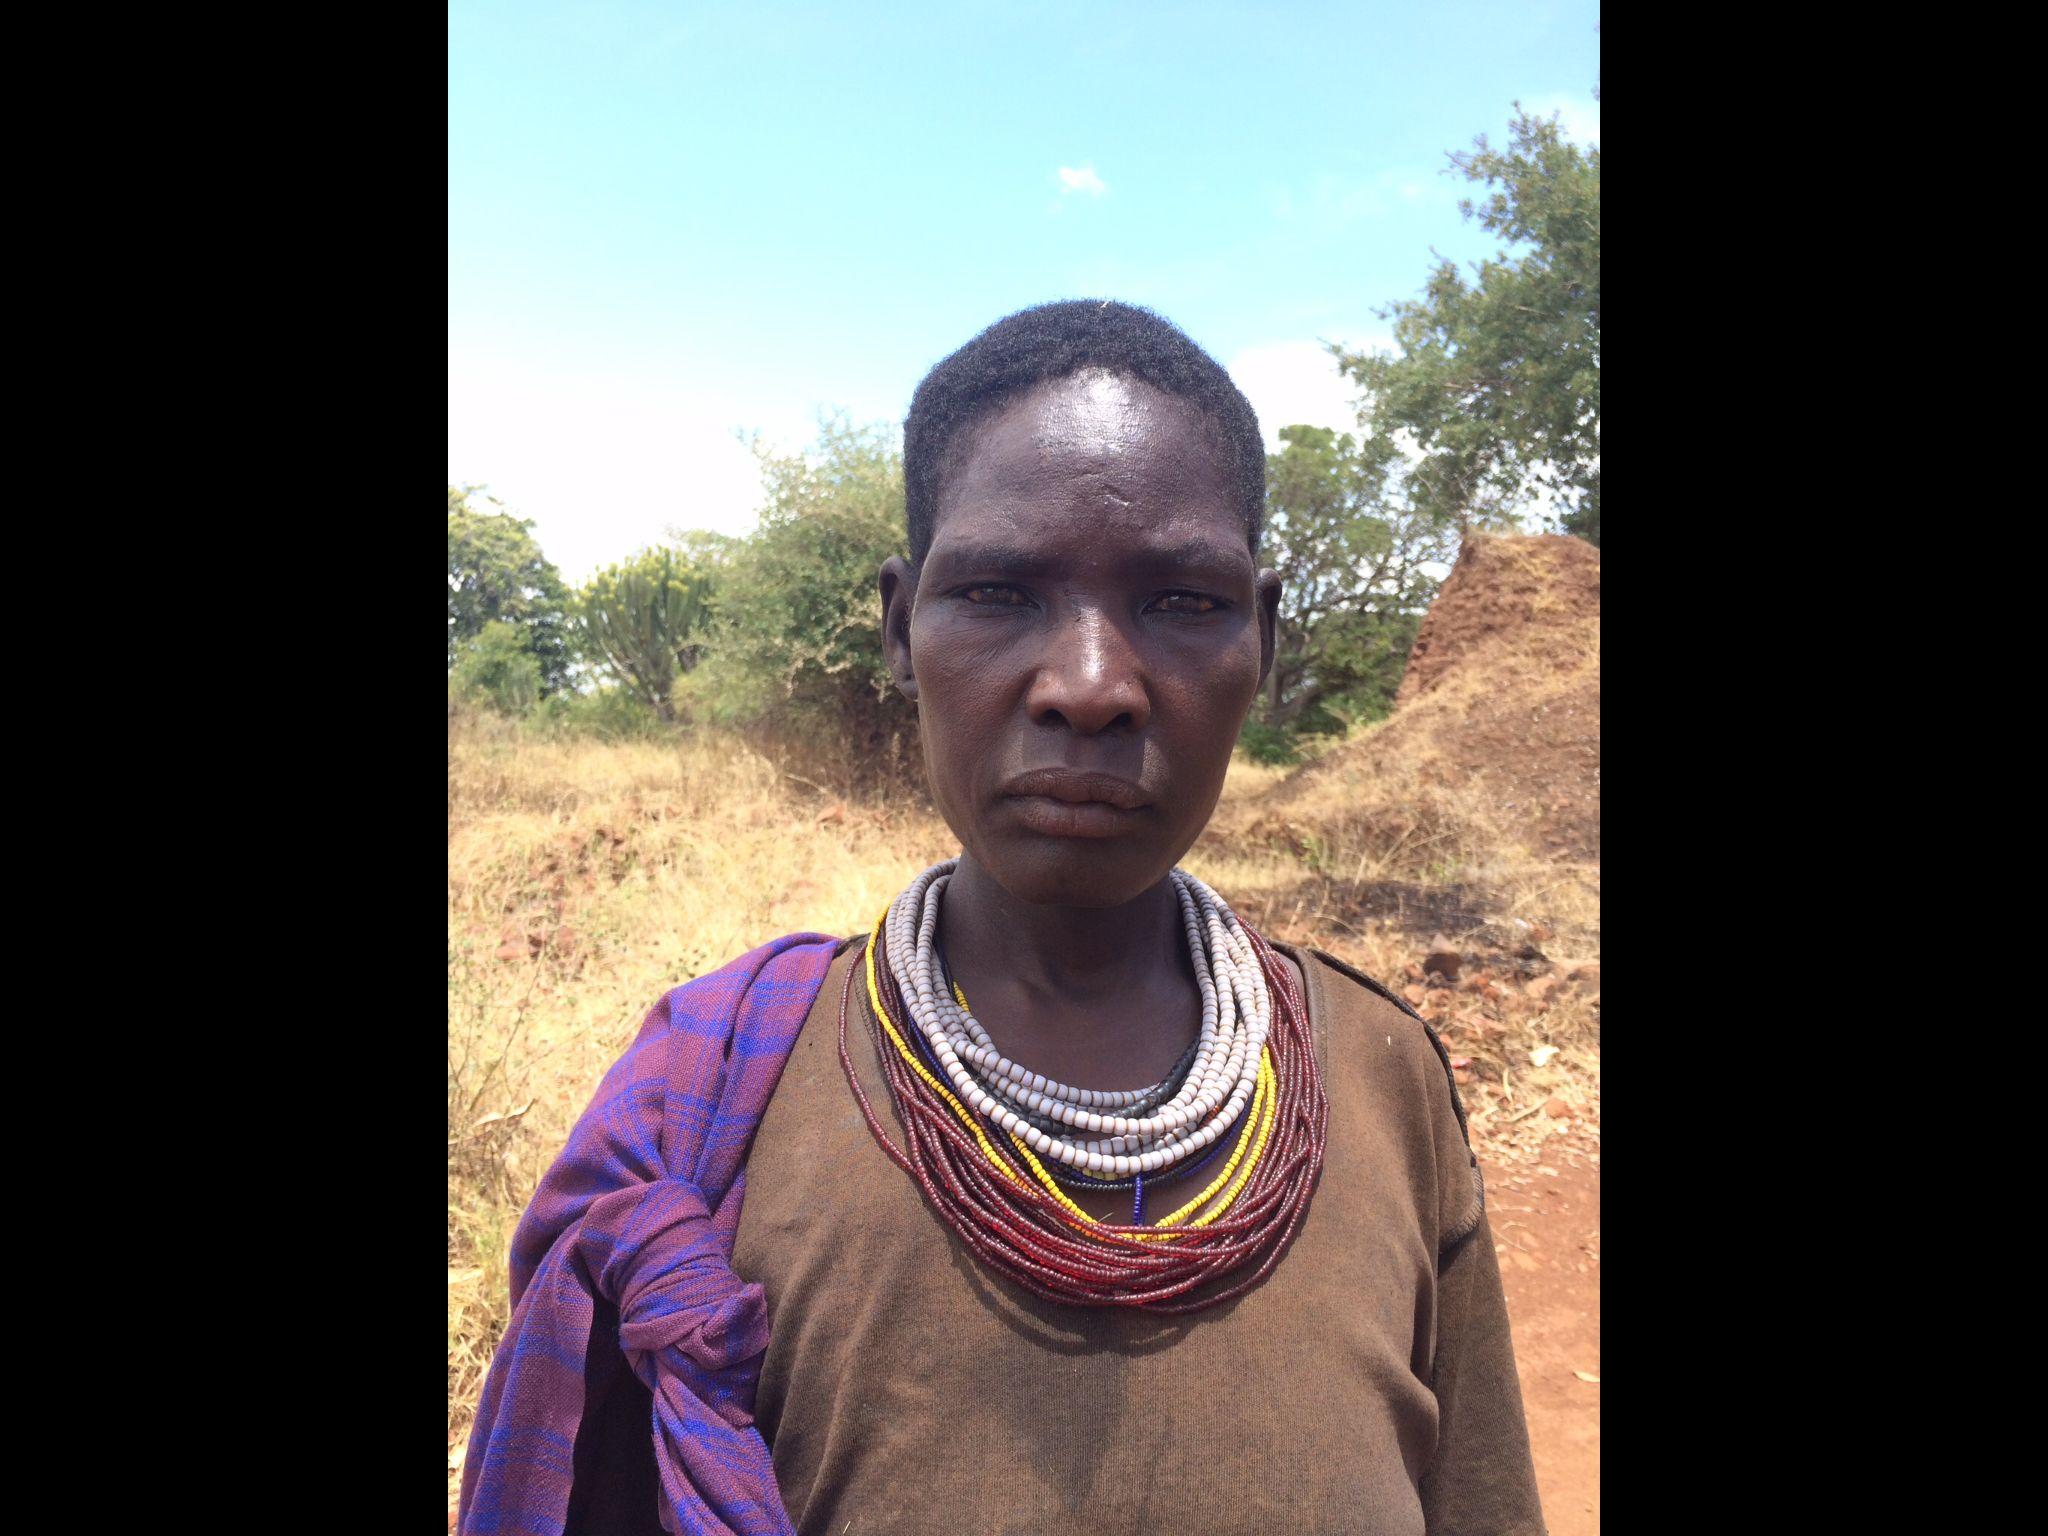 Karamajong tribe October 2015